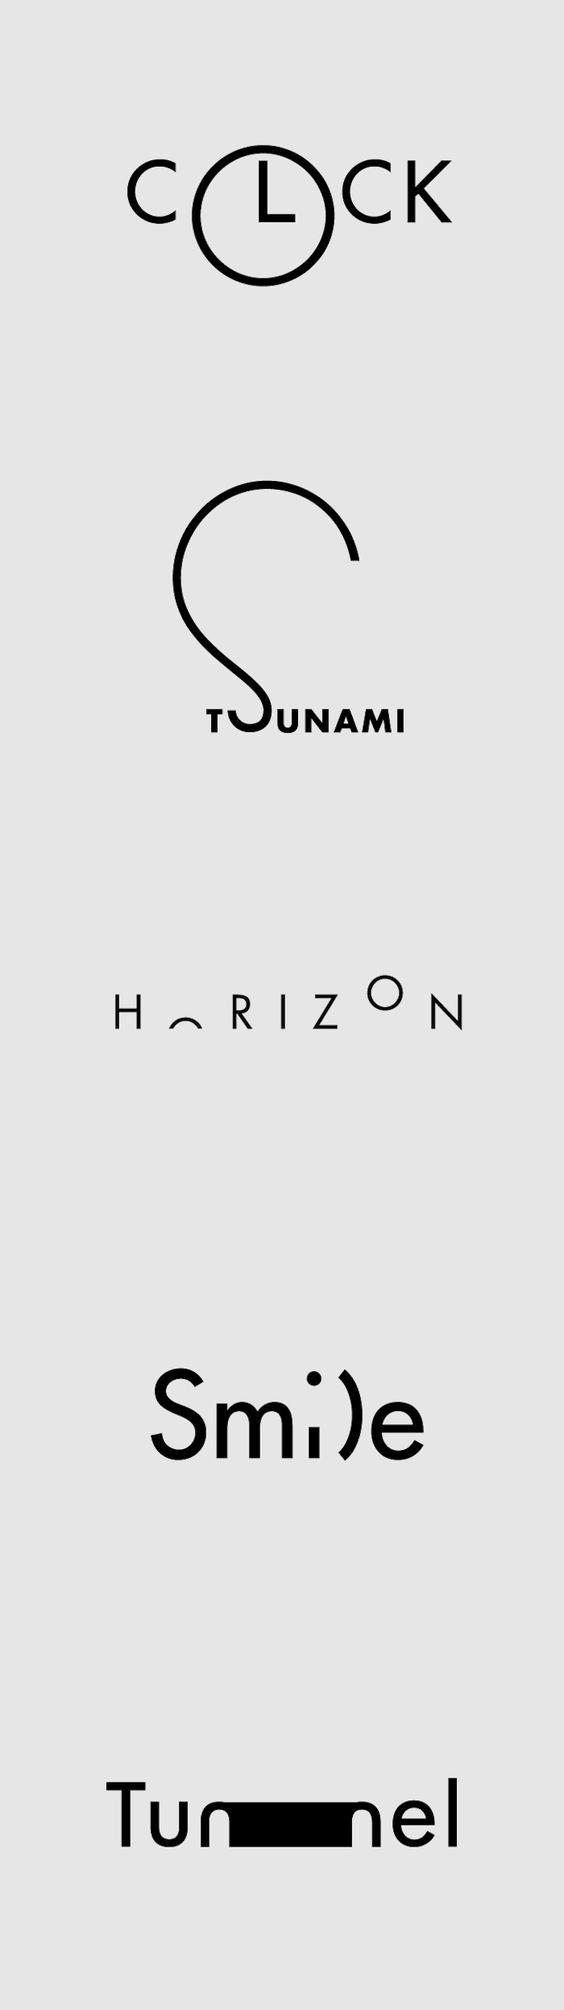 logotipos 2016 2